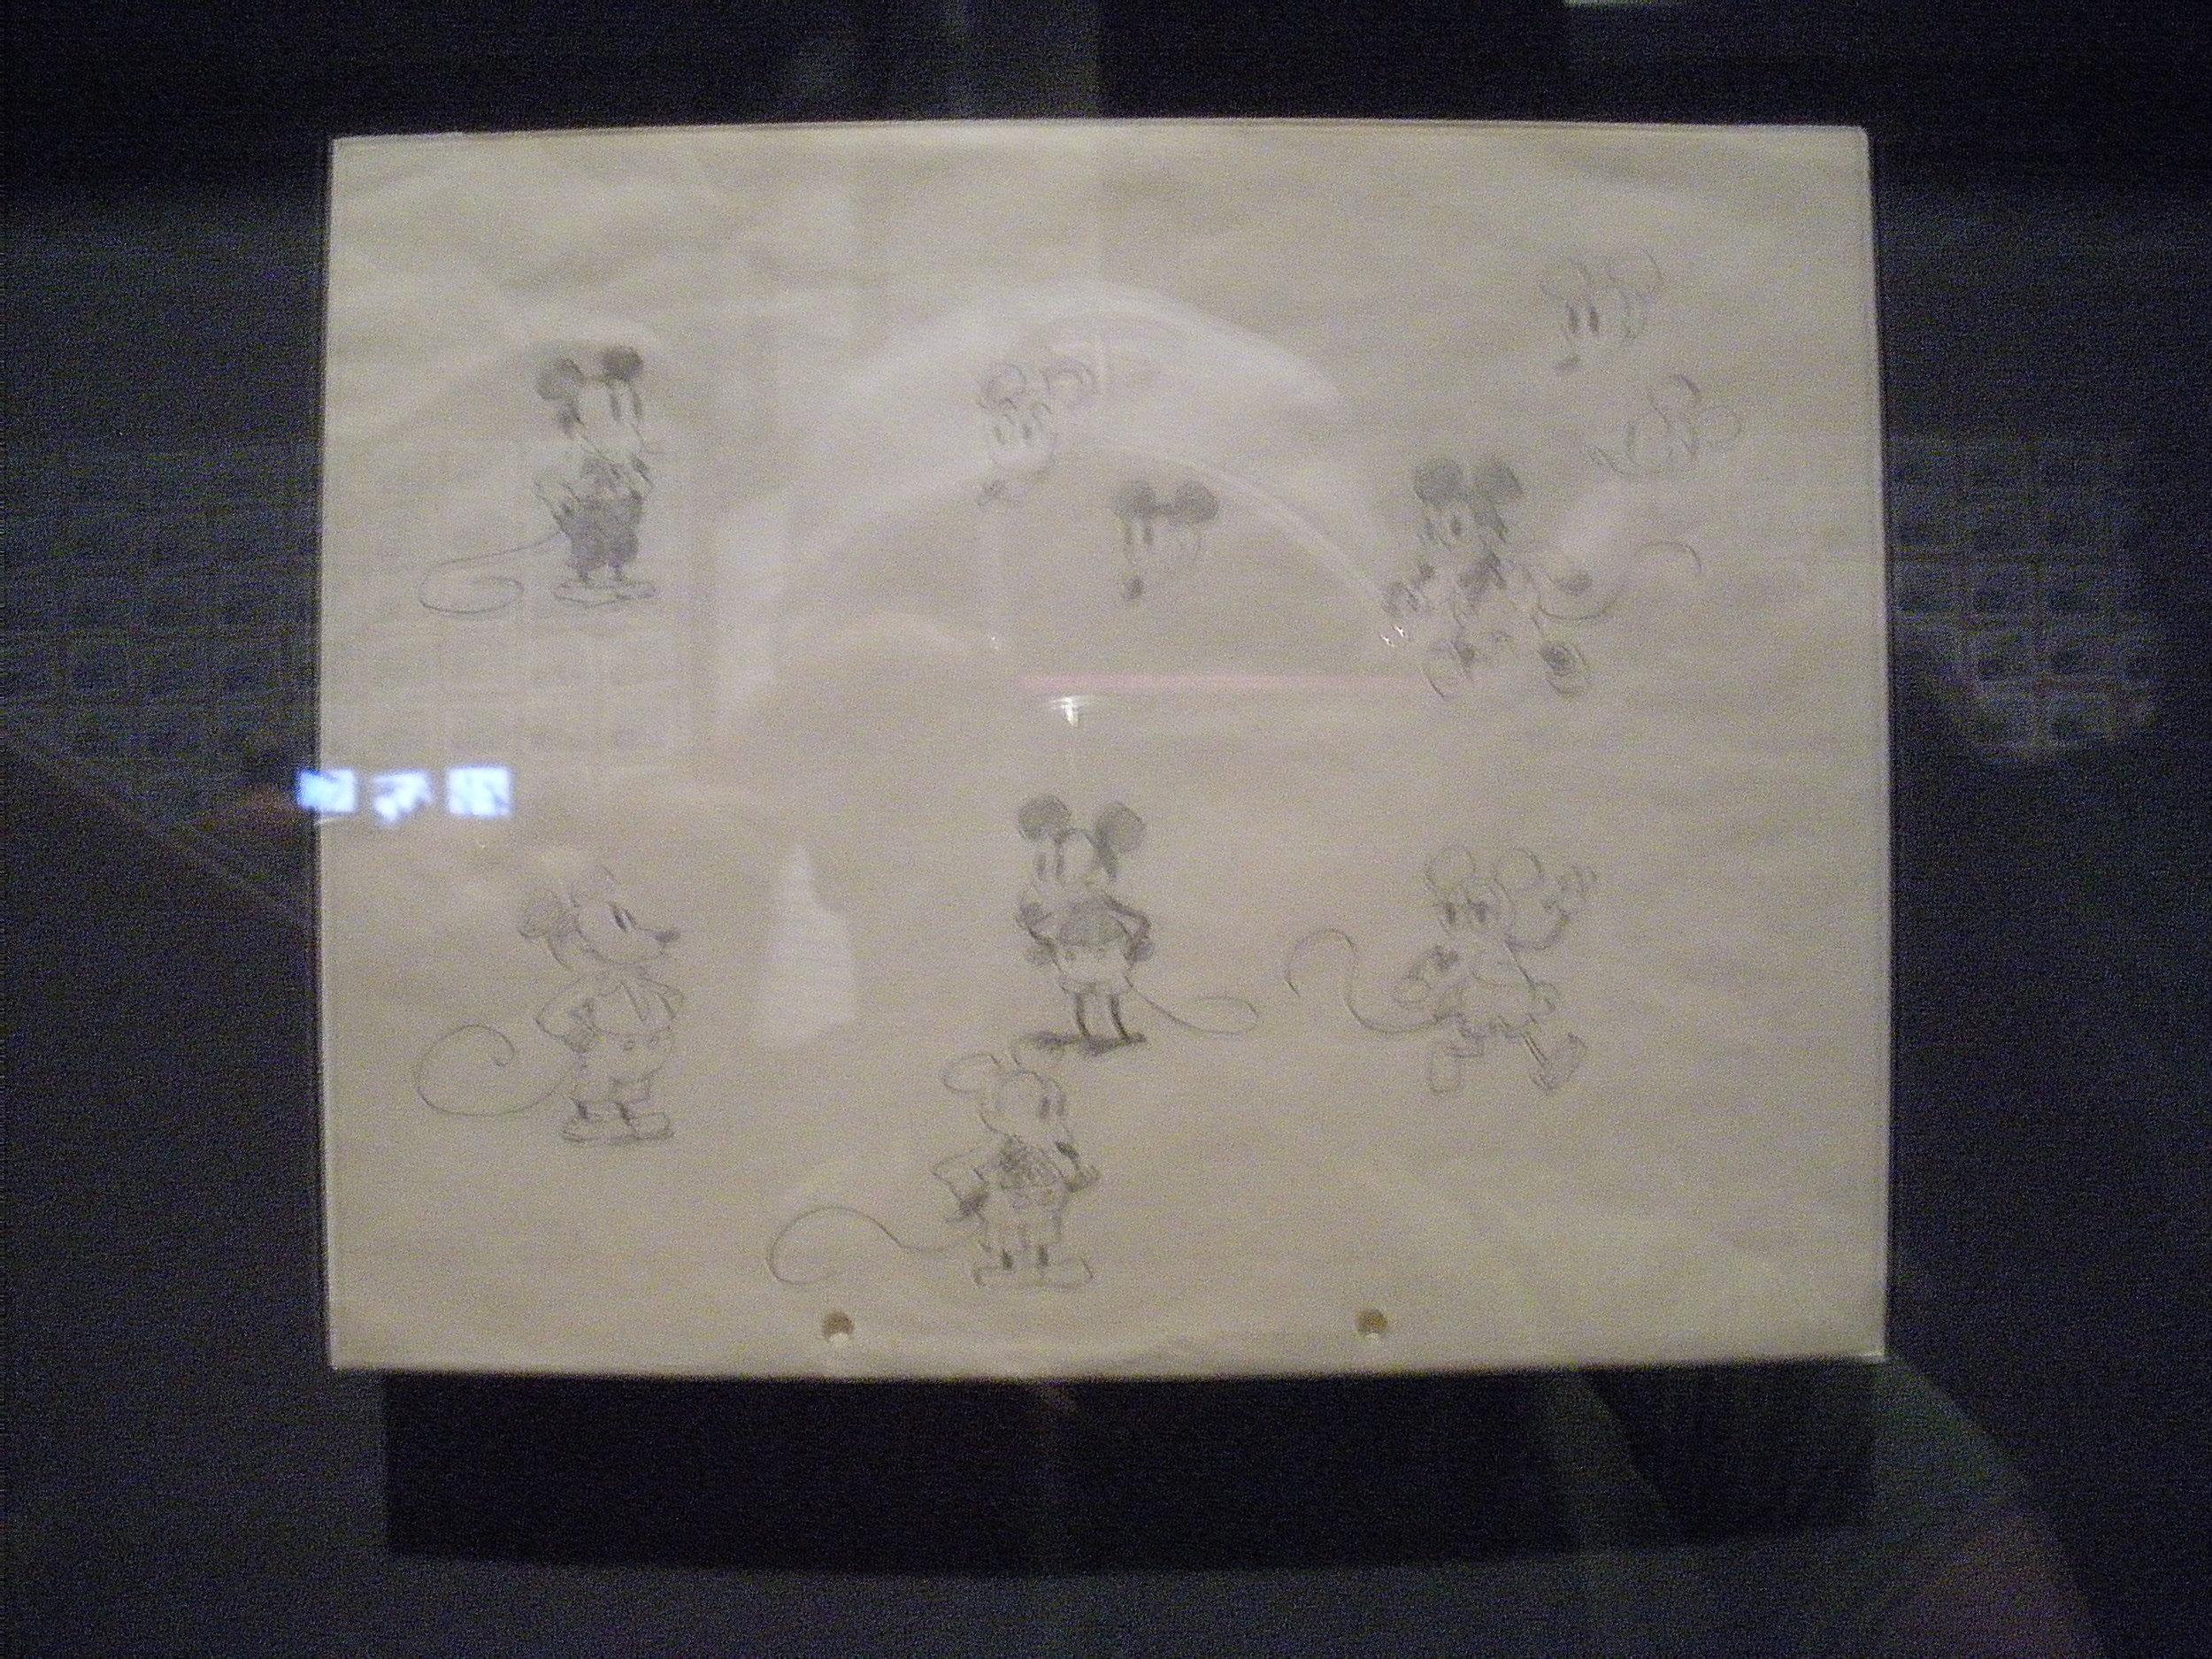 Some original sketches by Walt.